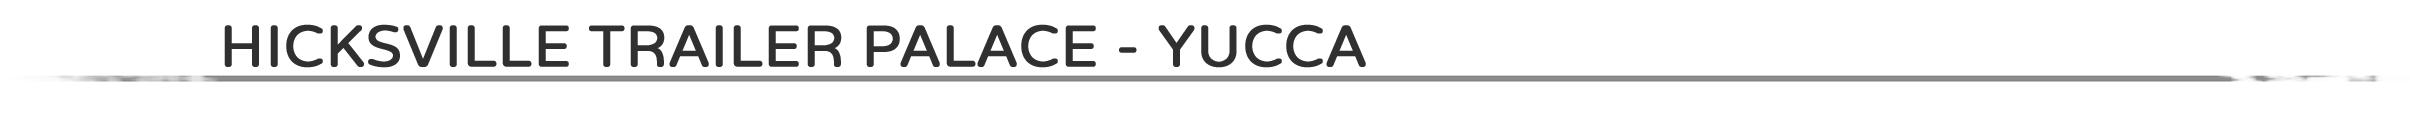 HICKSVILLE TRAILER PALACE - YUCCA.png